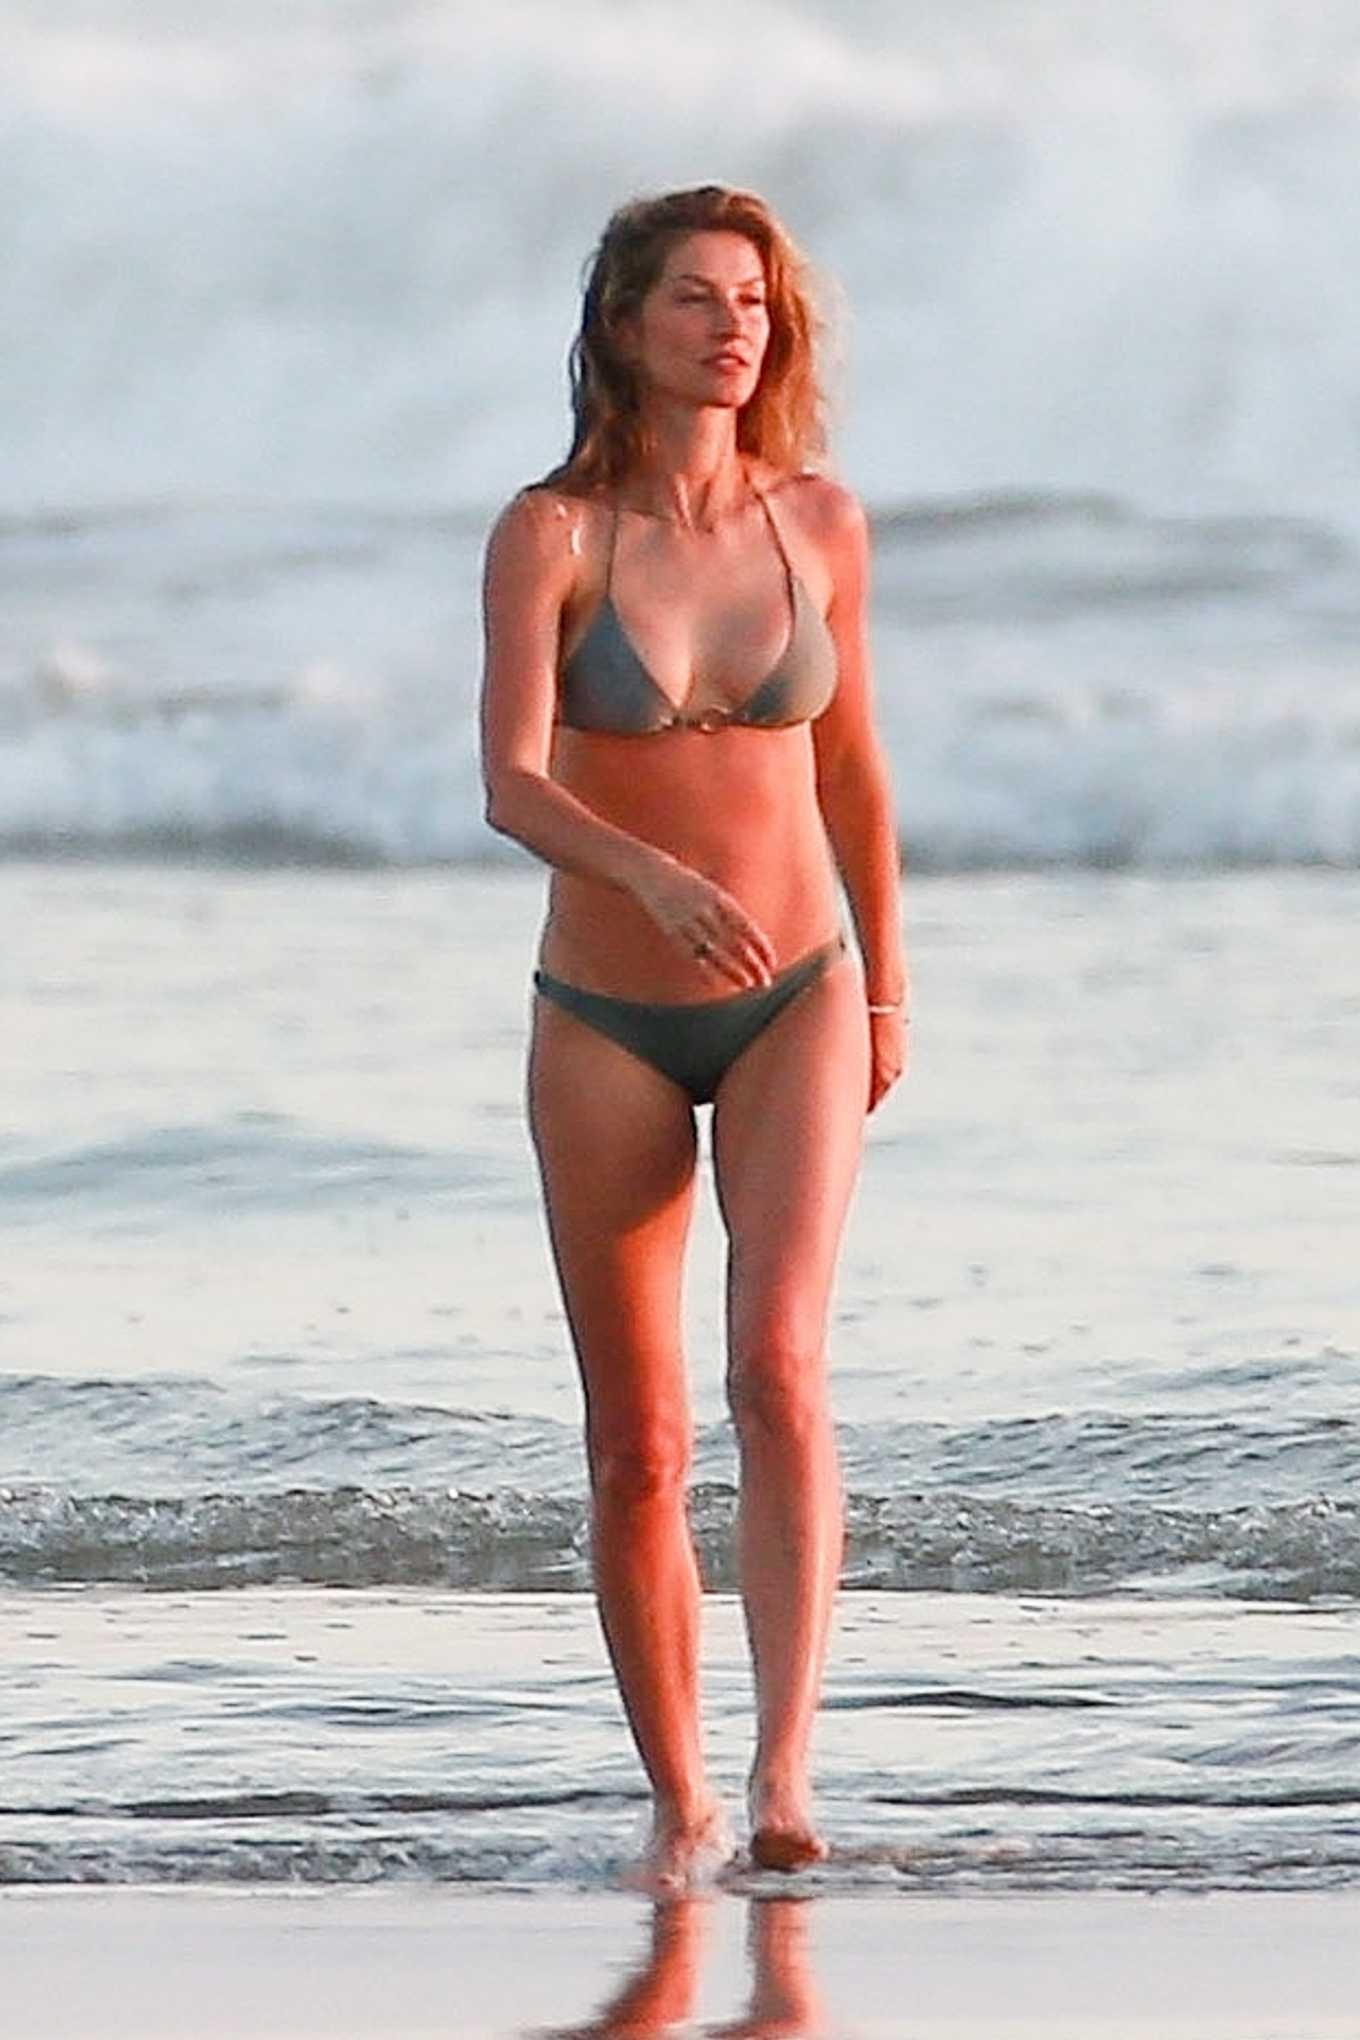 Gisele Bundchen in Bikini on vacationing in Costa Rica